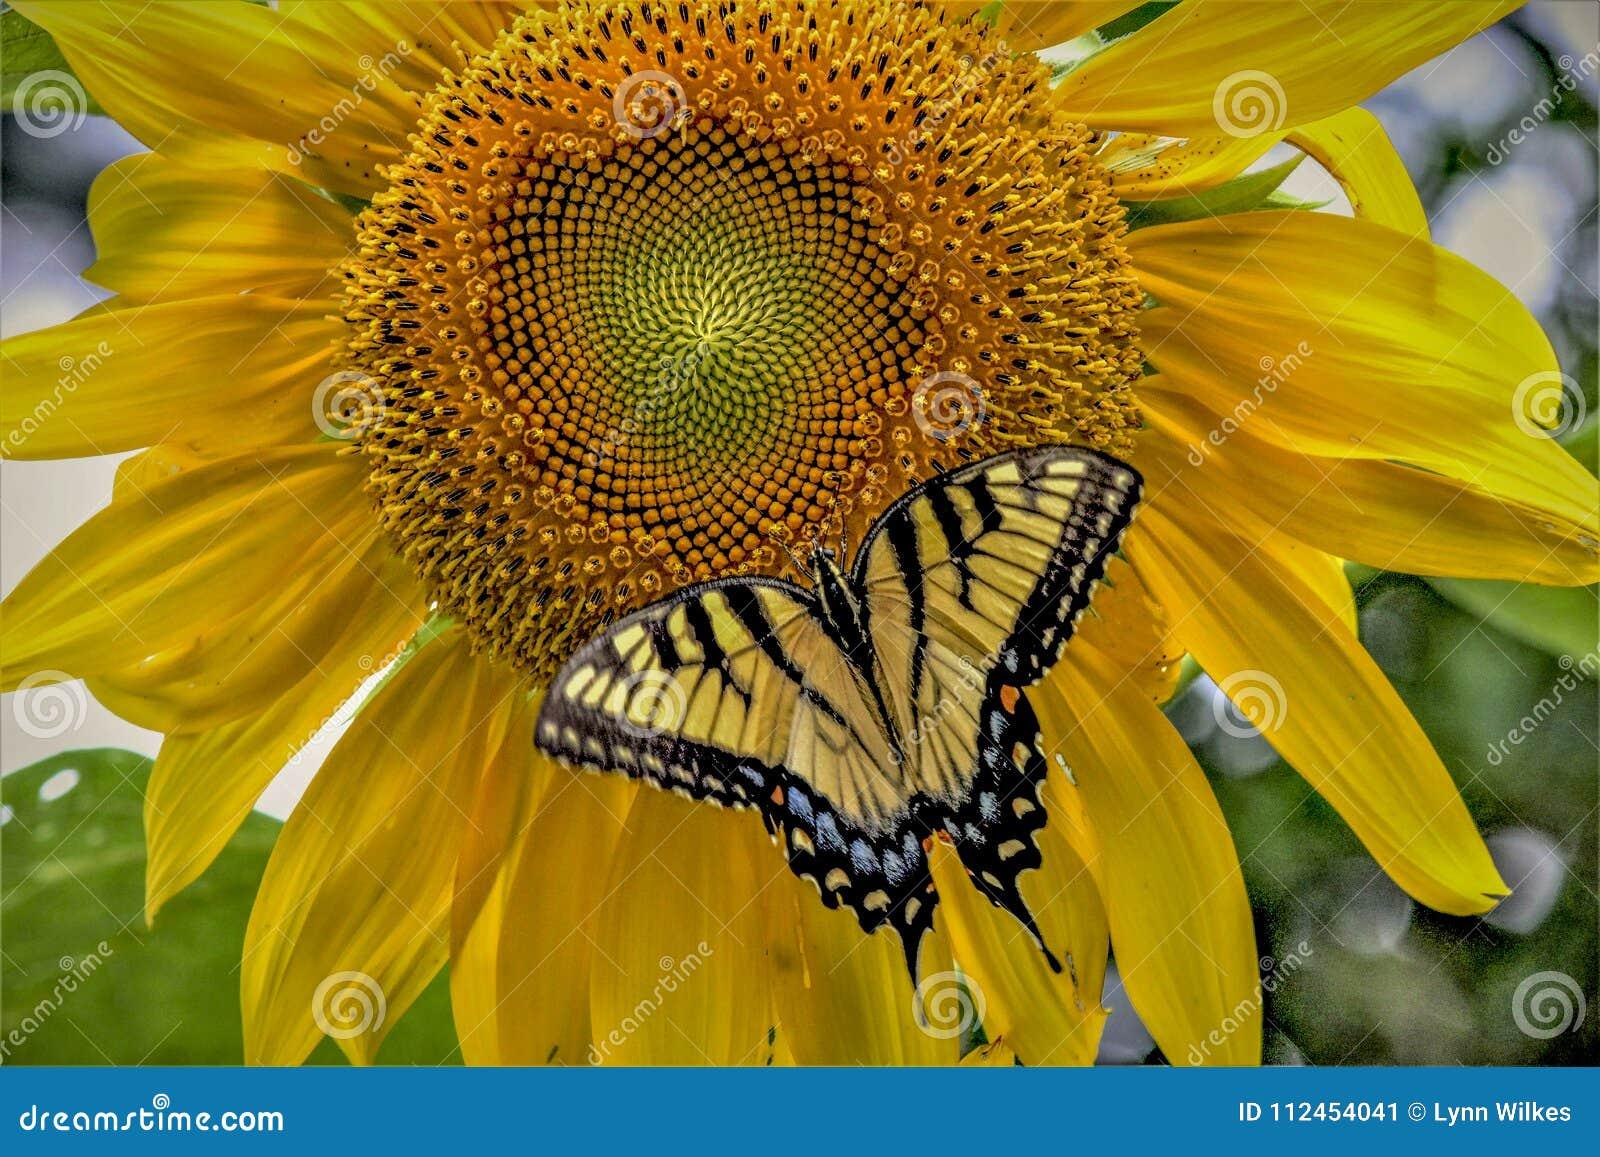 Borboleta de Swallowtail em um girassol